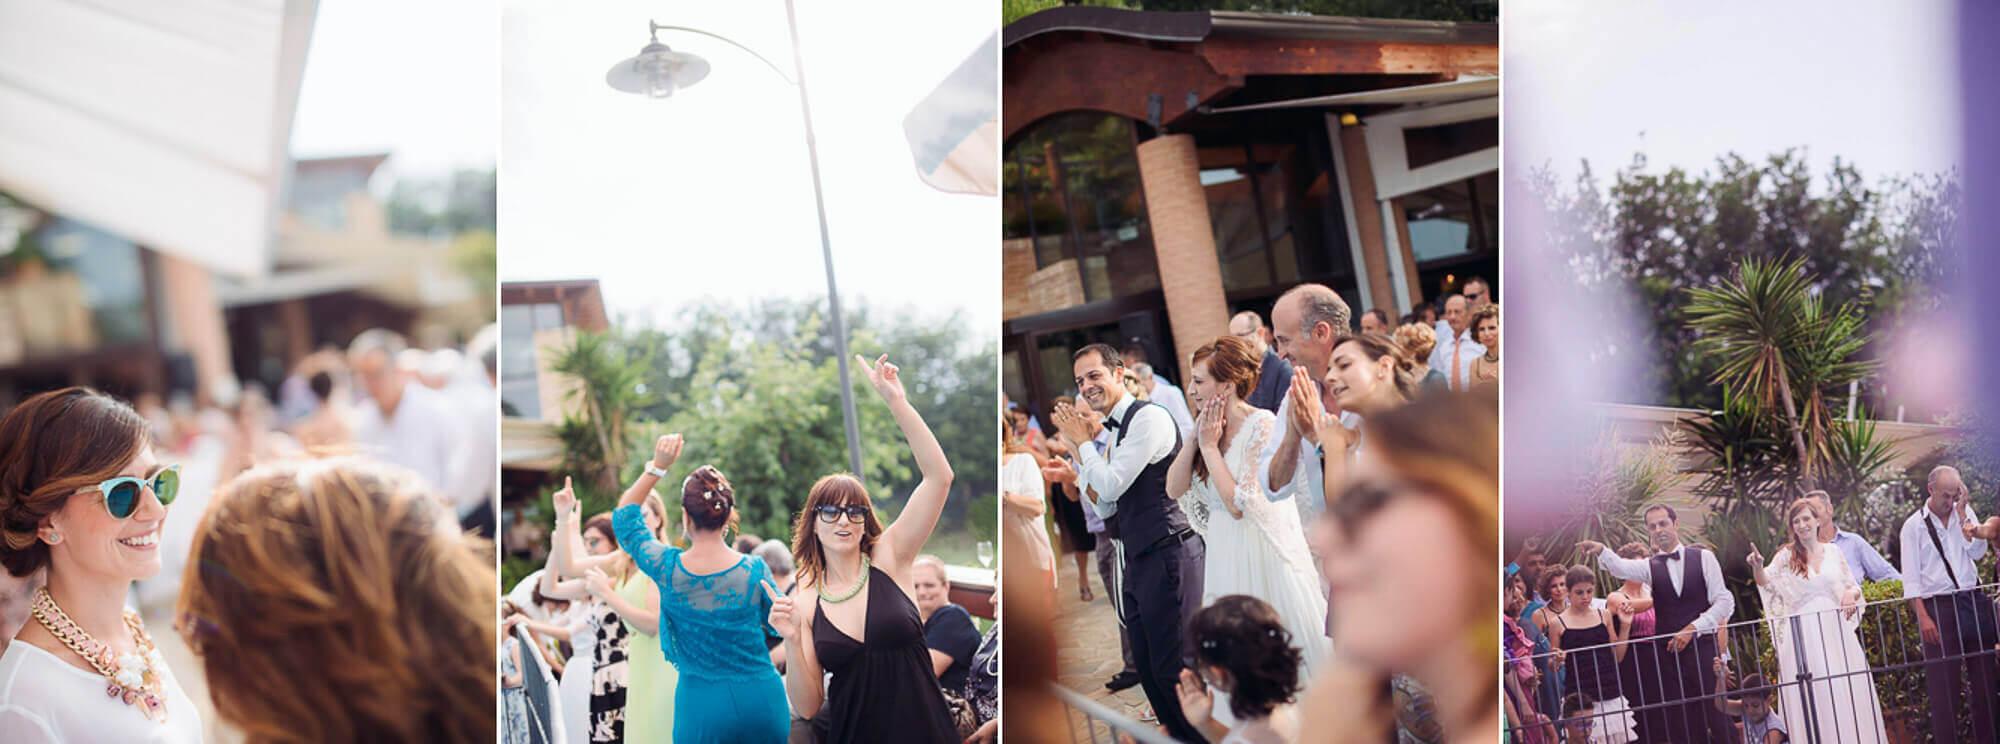 132_wedding_marche.jpg